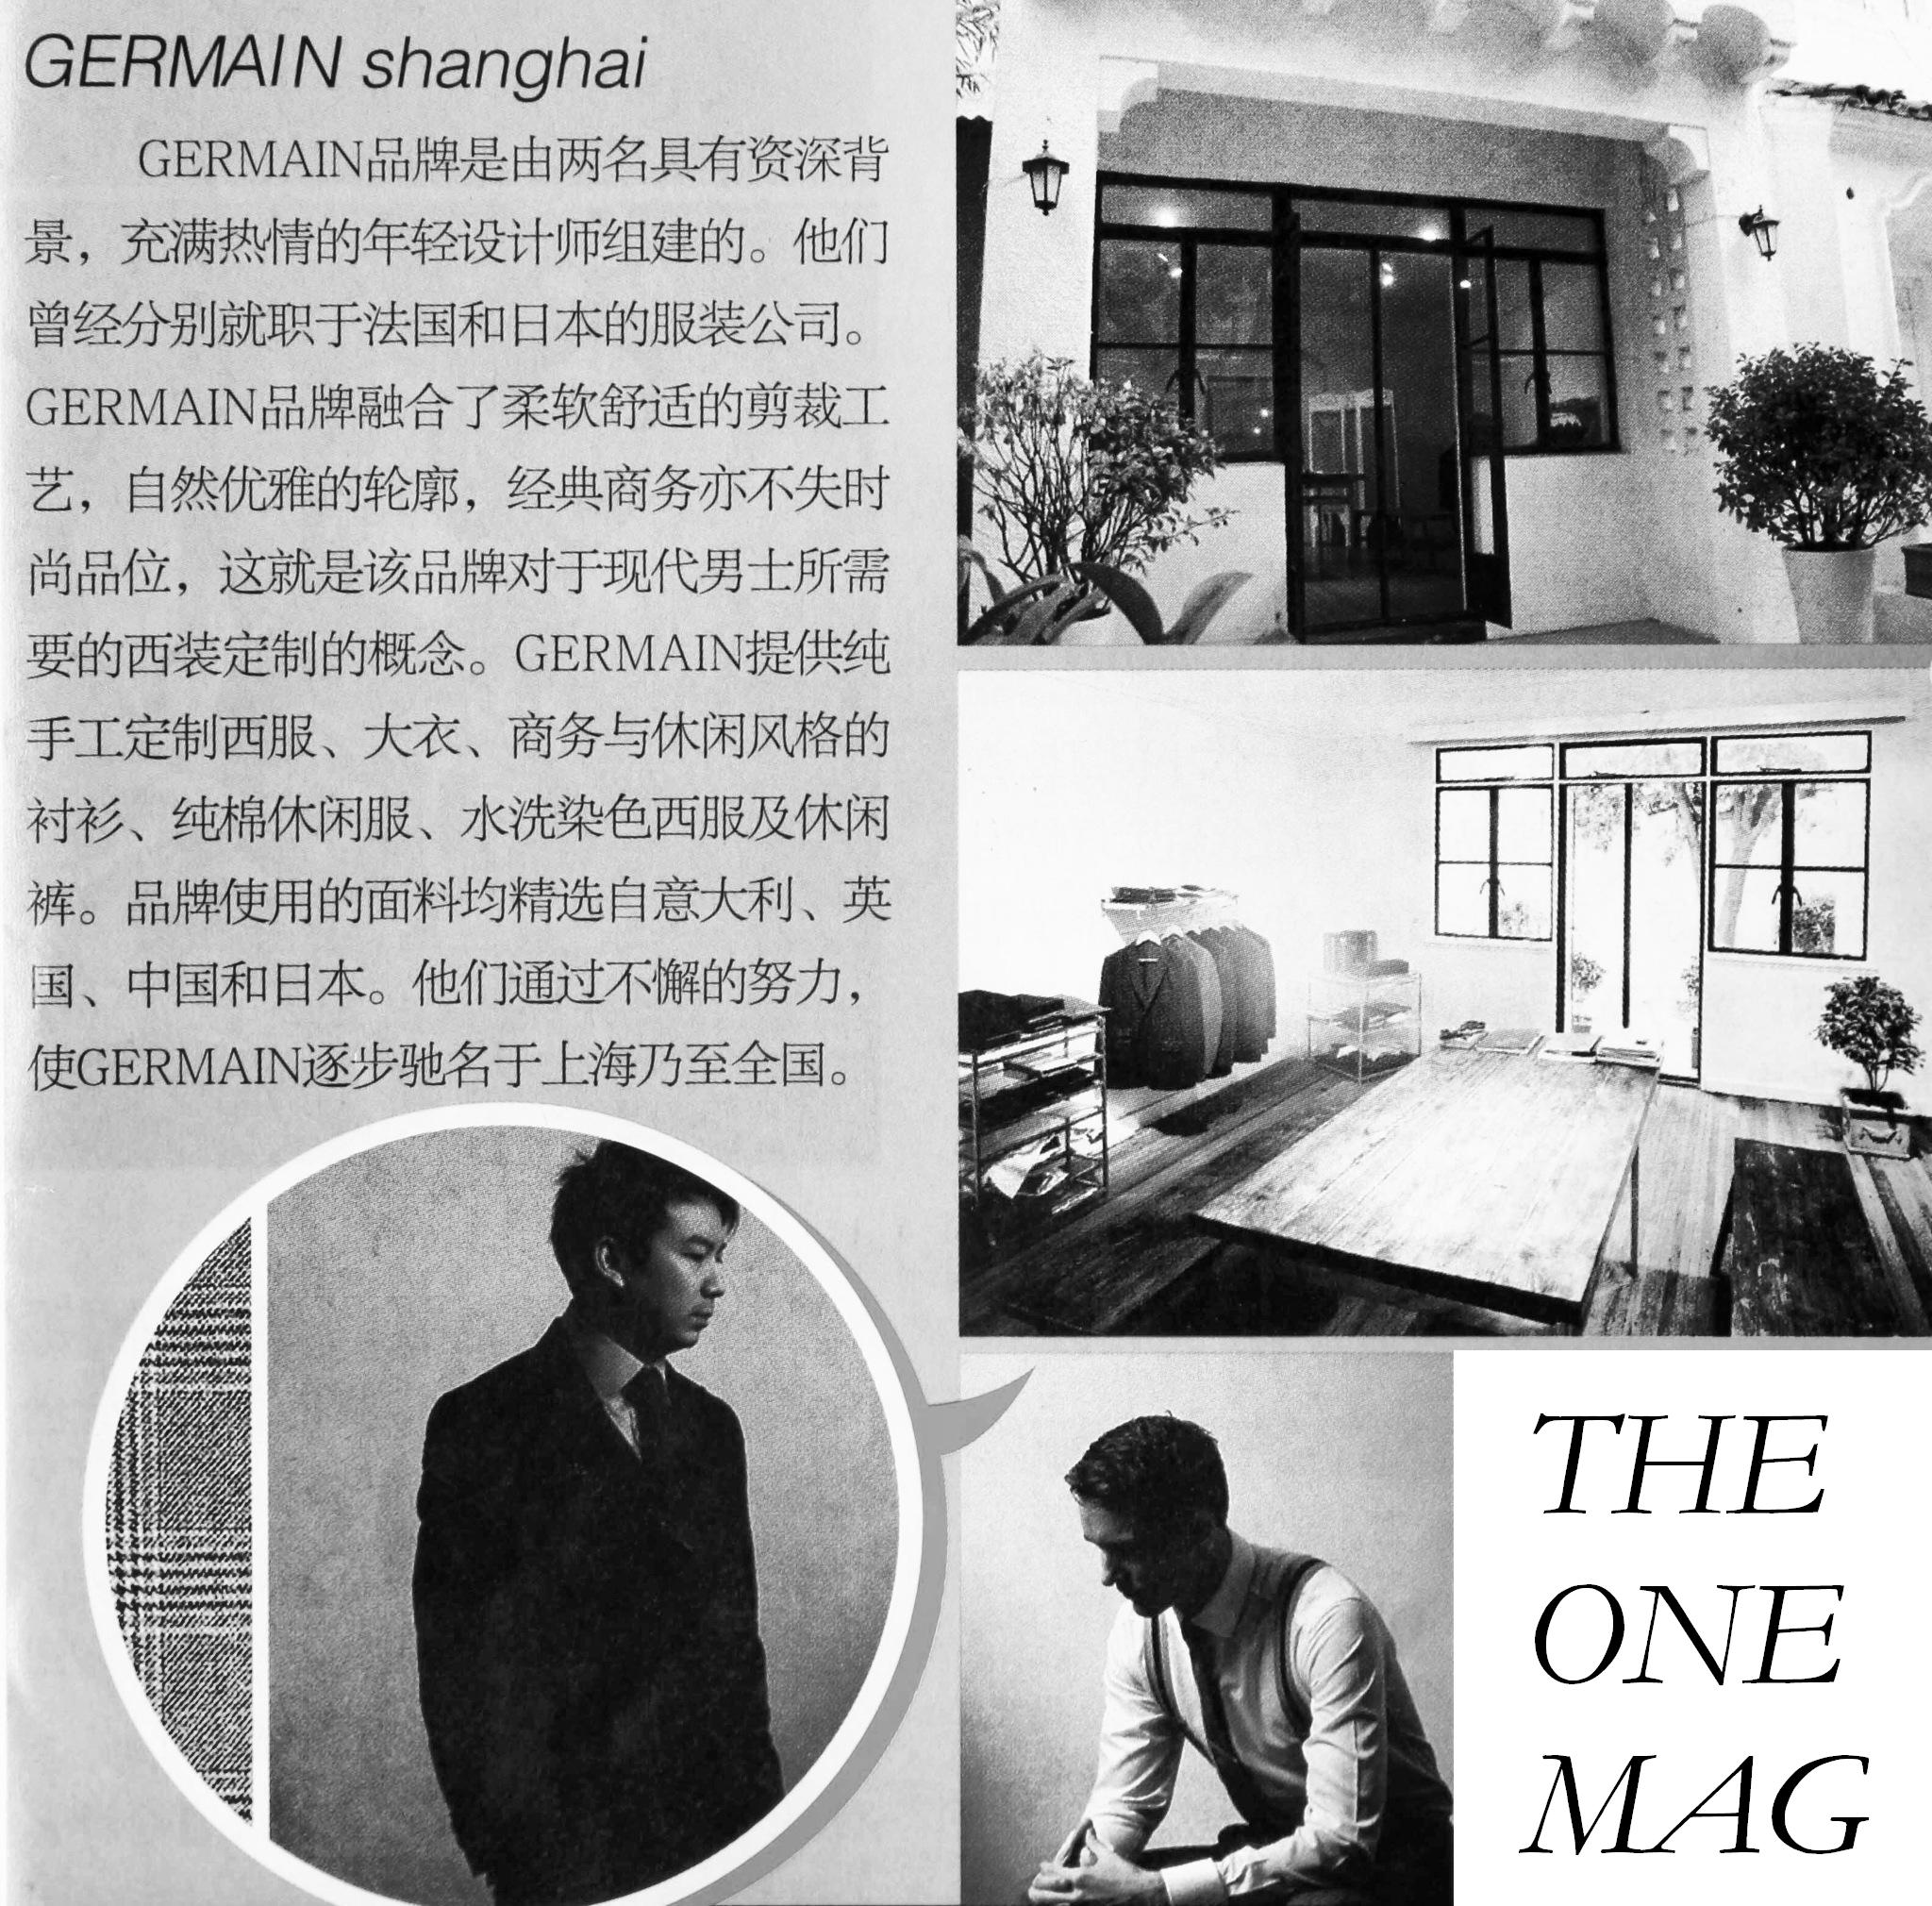 the one mag photo.JPG